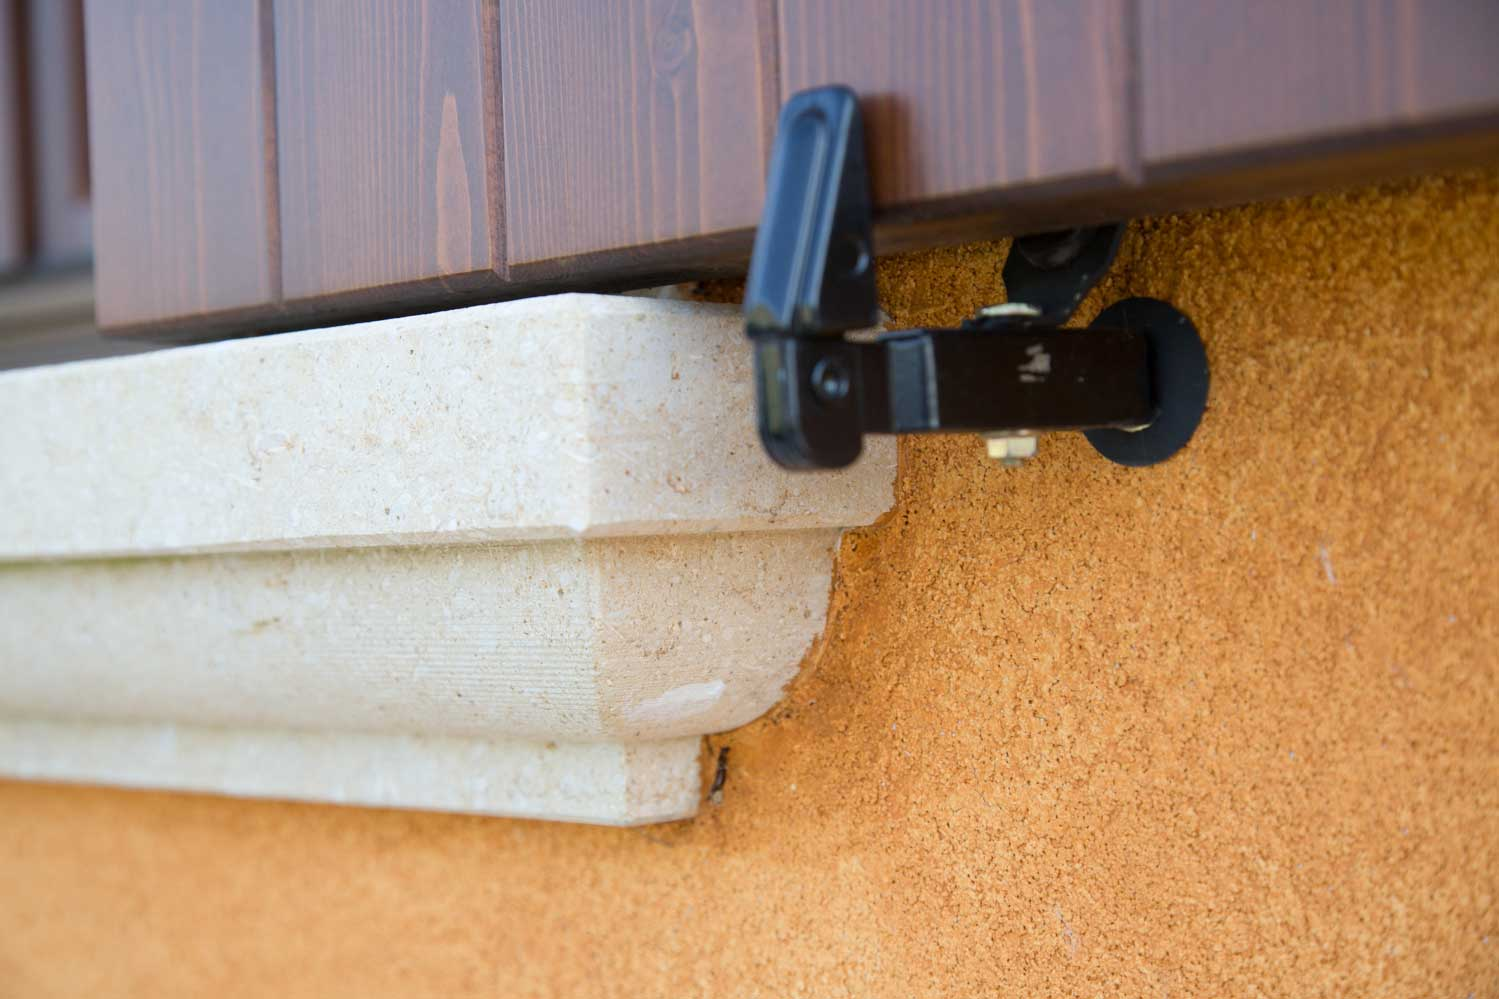 mignolli contorni porte finestre verona